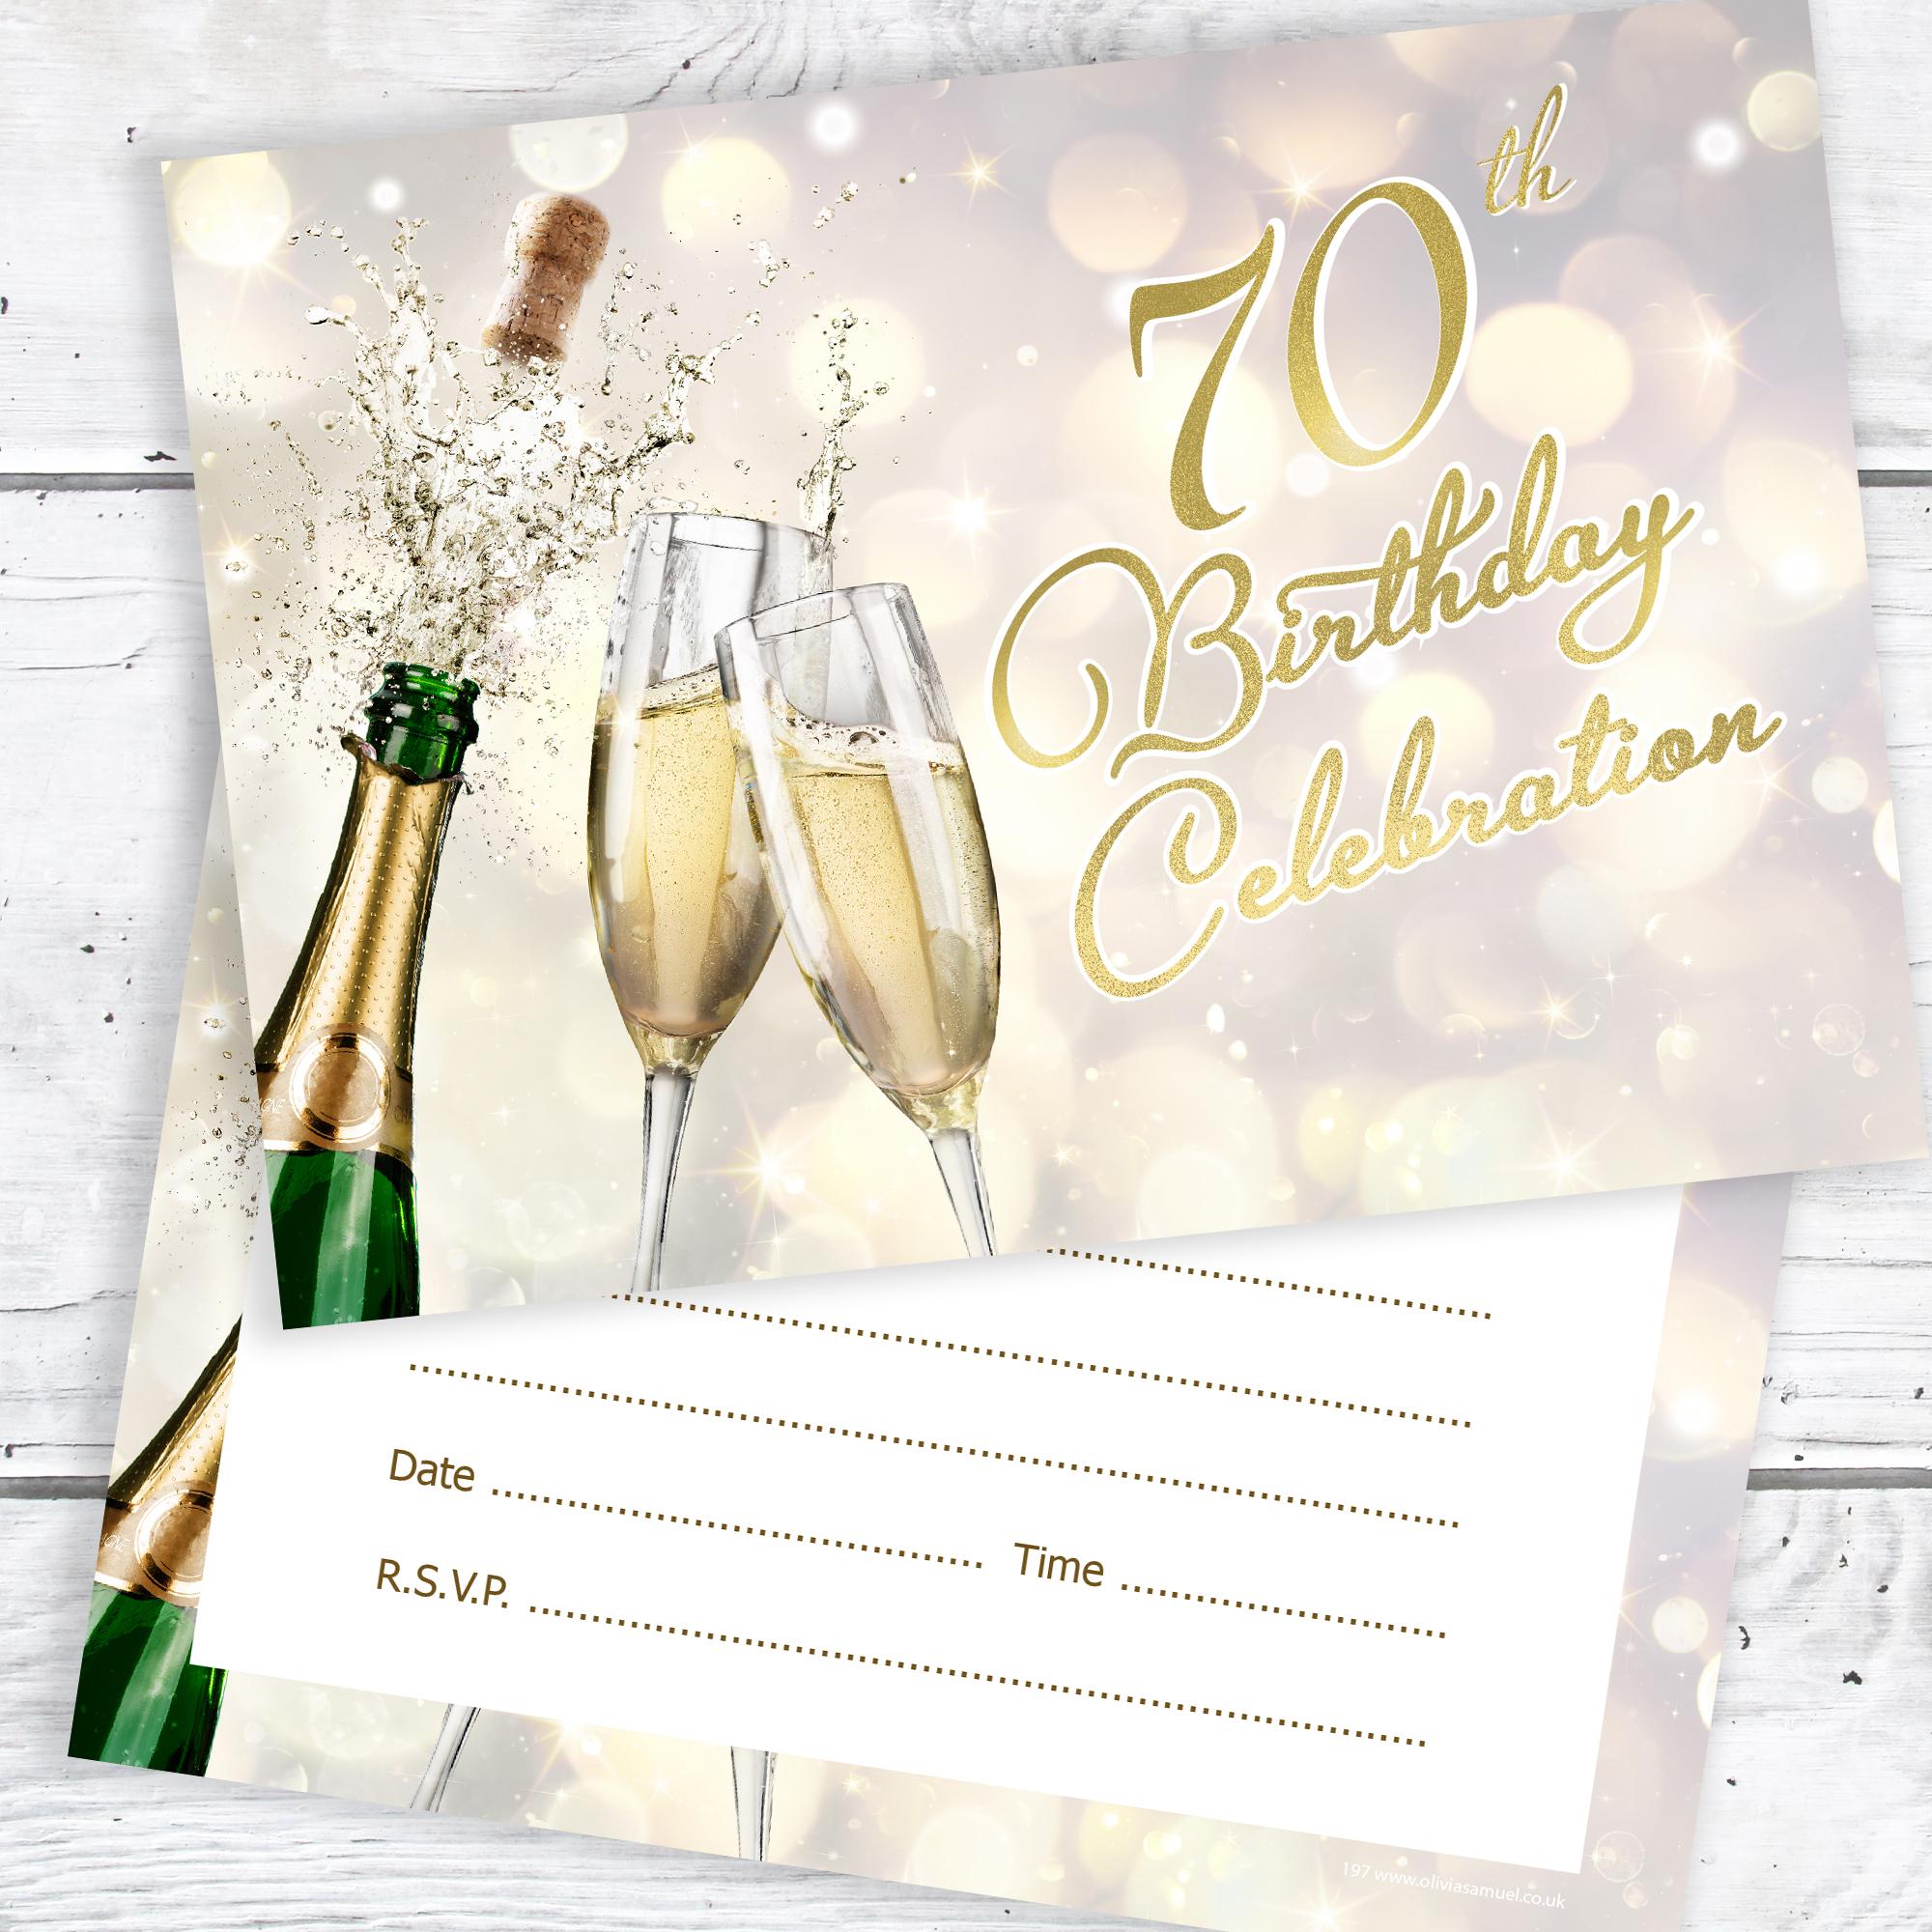 70th Birthday Invitations Champagne Style